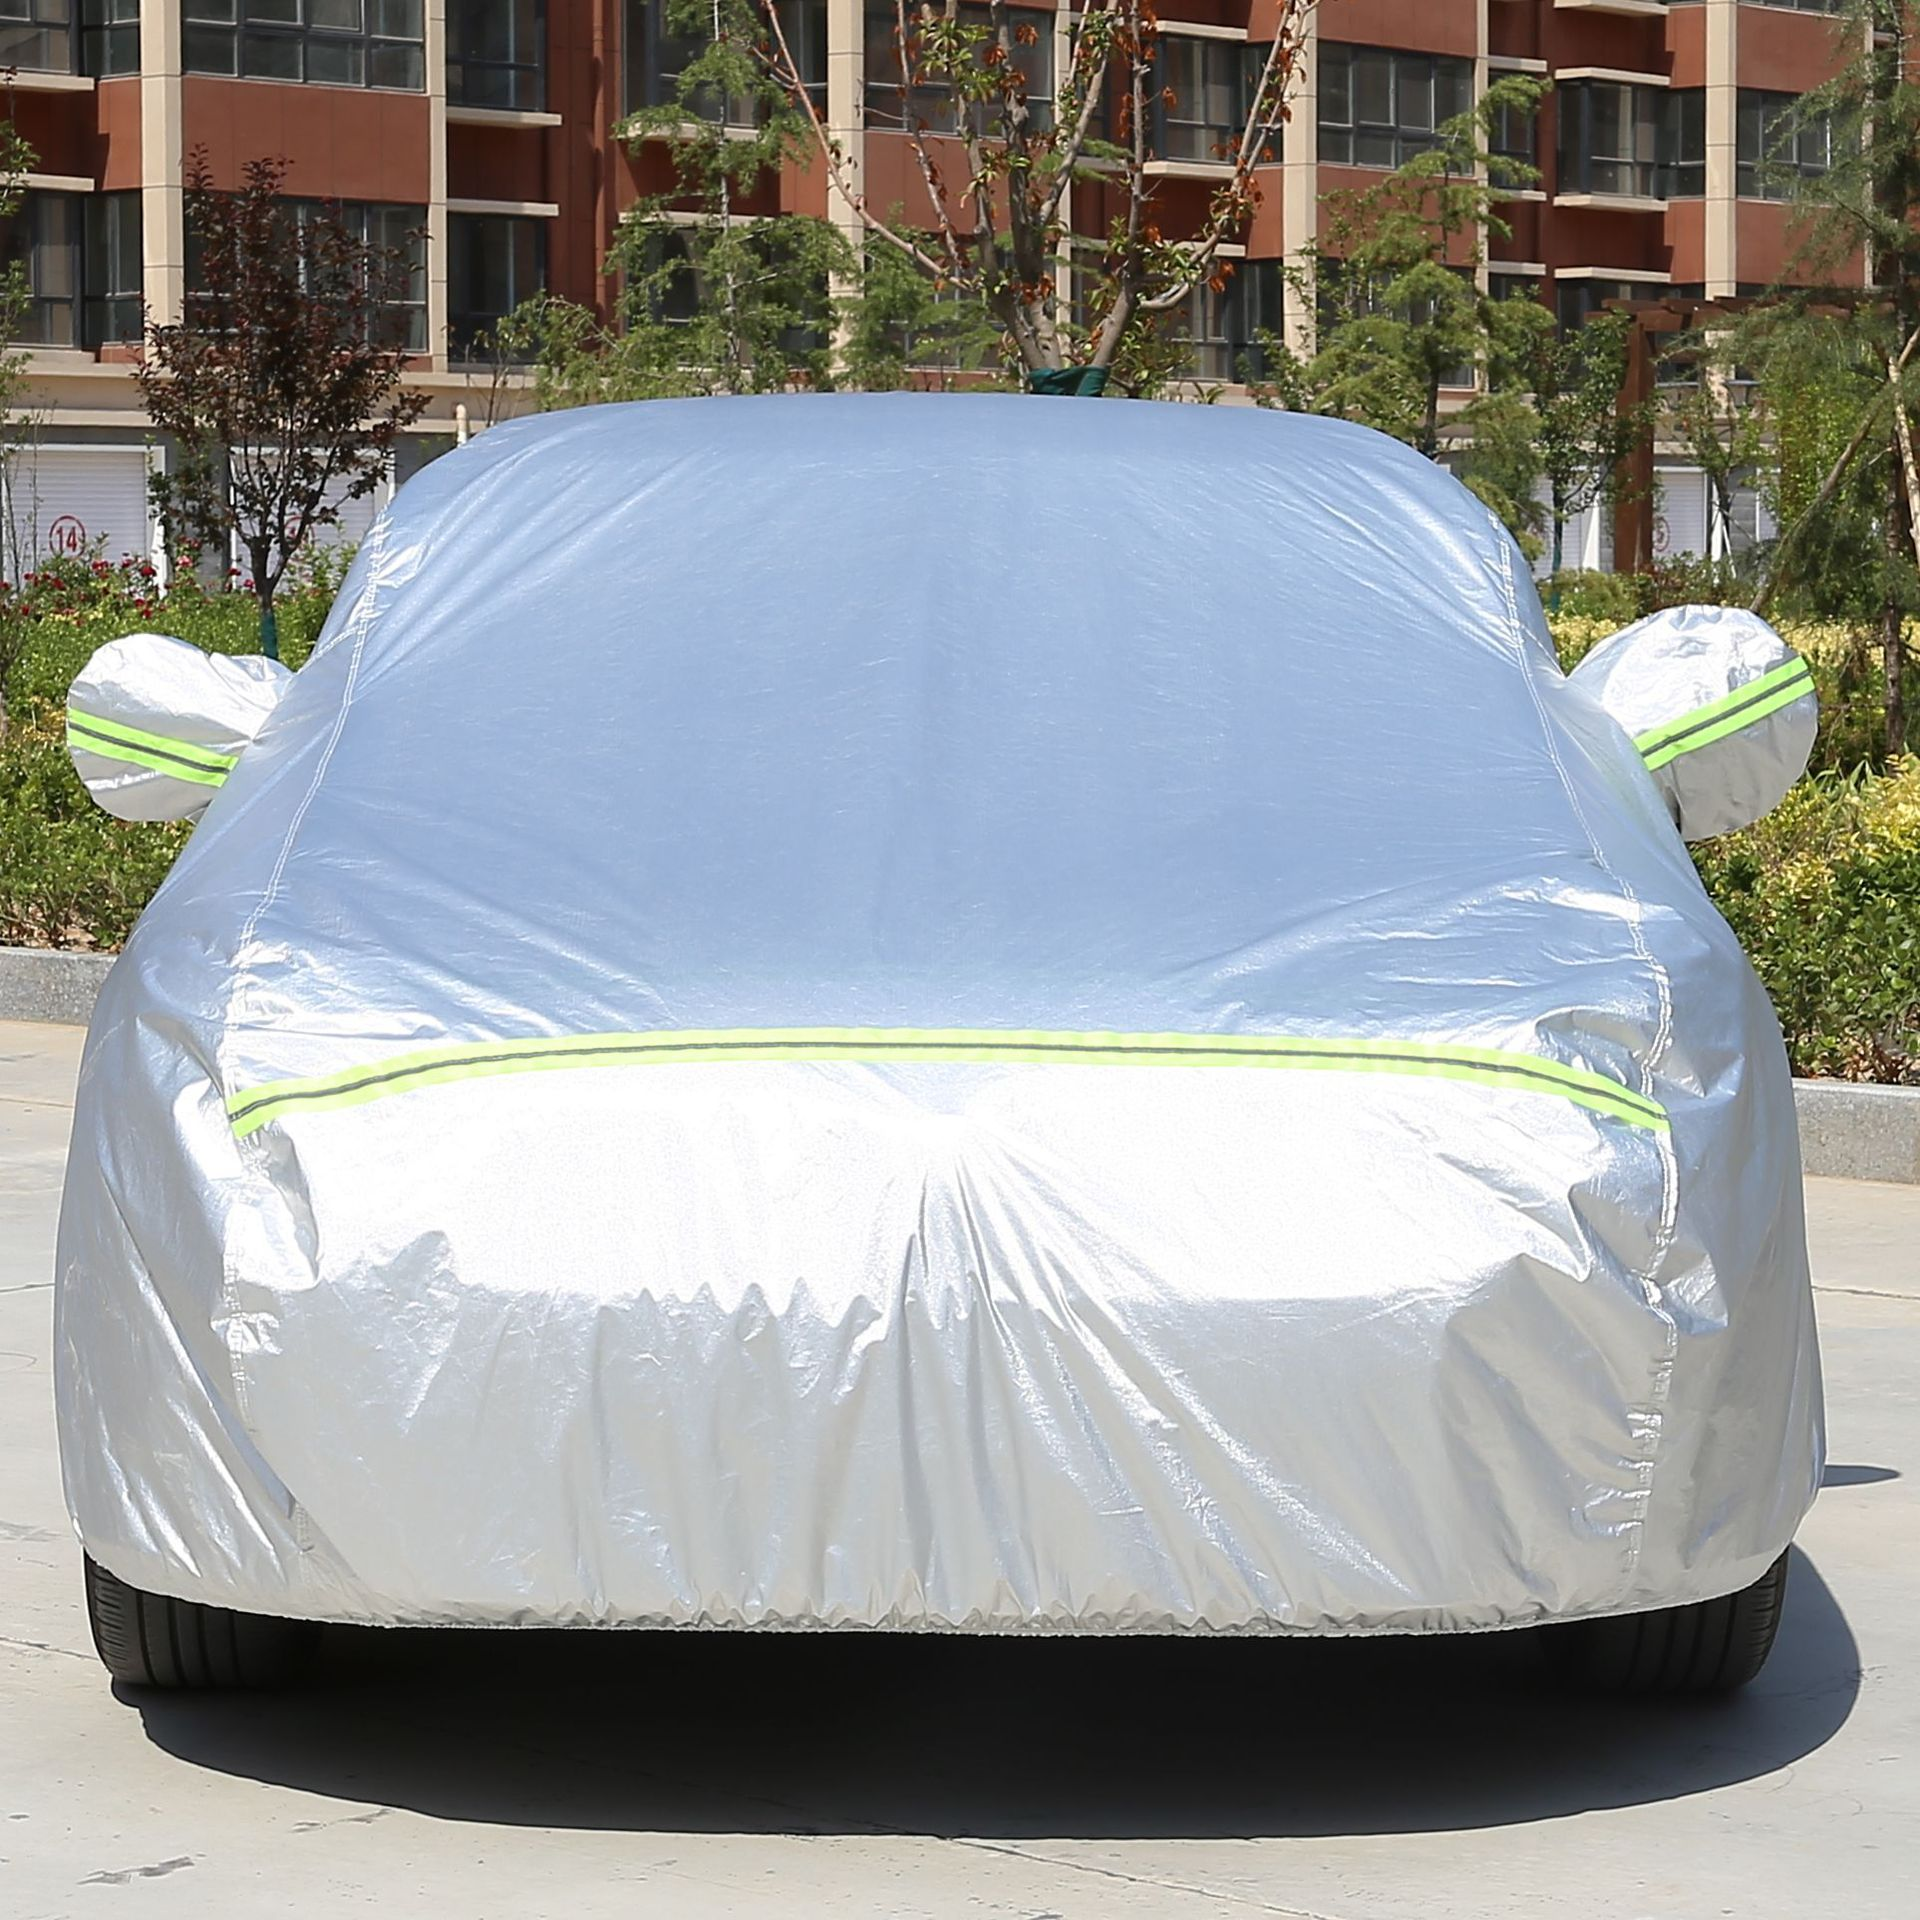 Thickened car clothing sunscreen clothing sunshade heat insulation car clothing rainproof car suppli